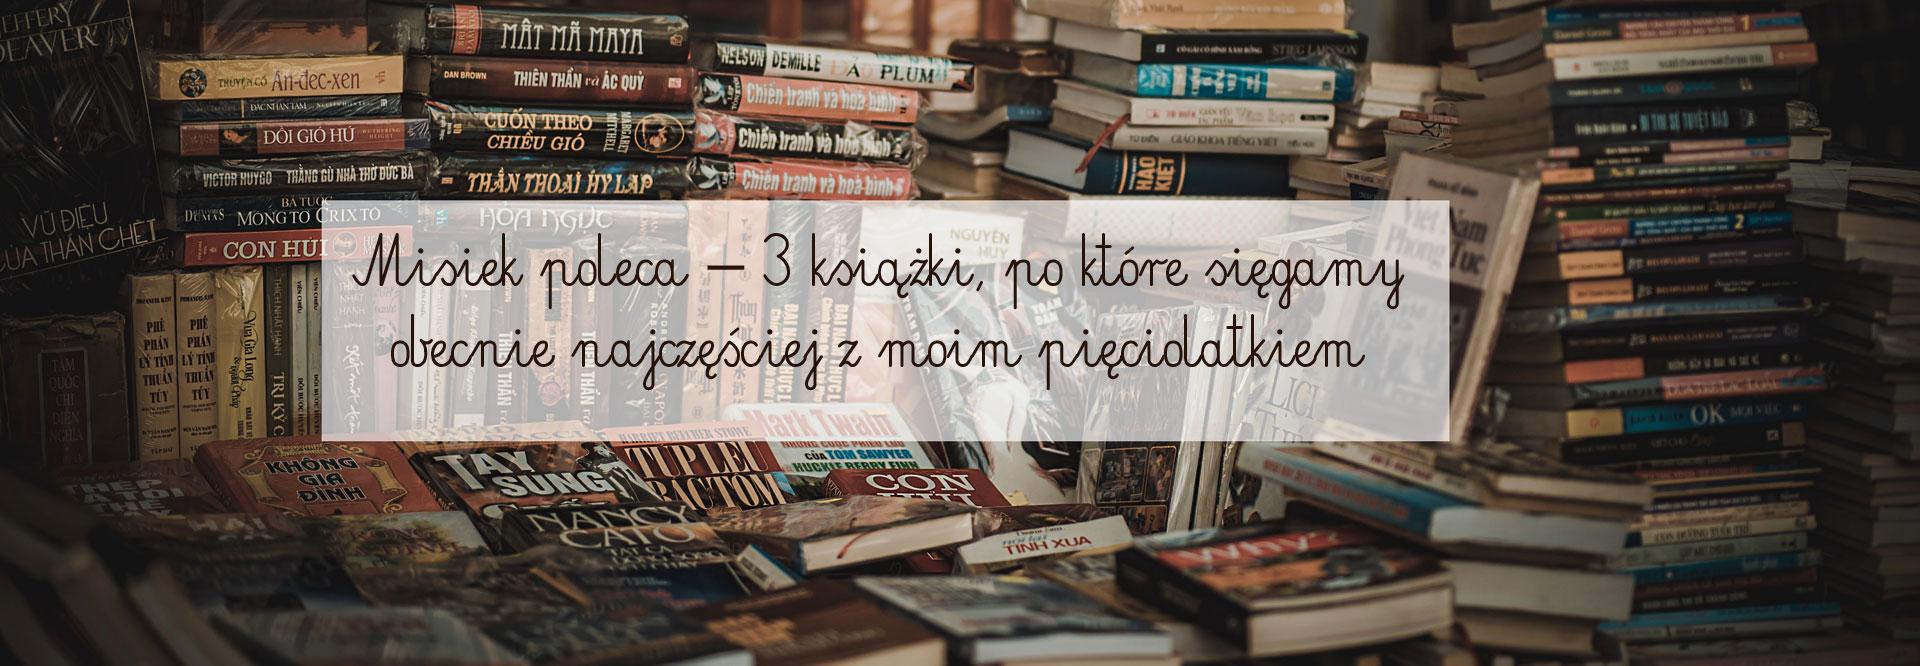 book-bindings-bookcase-books-694740